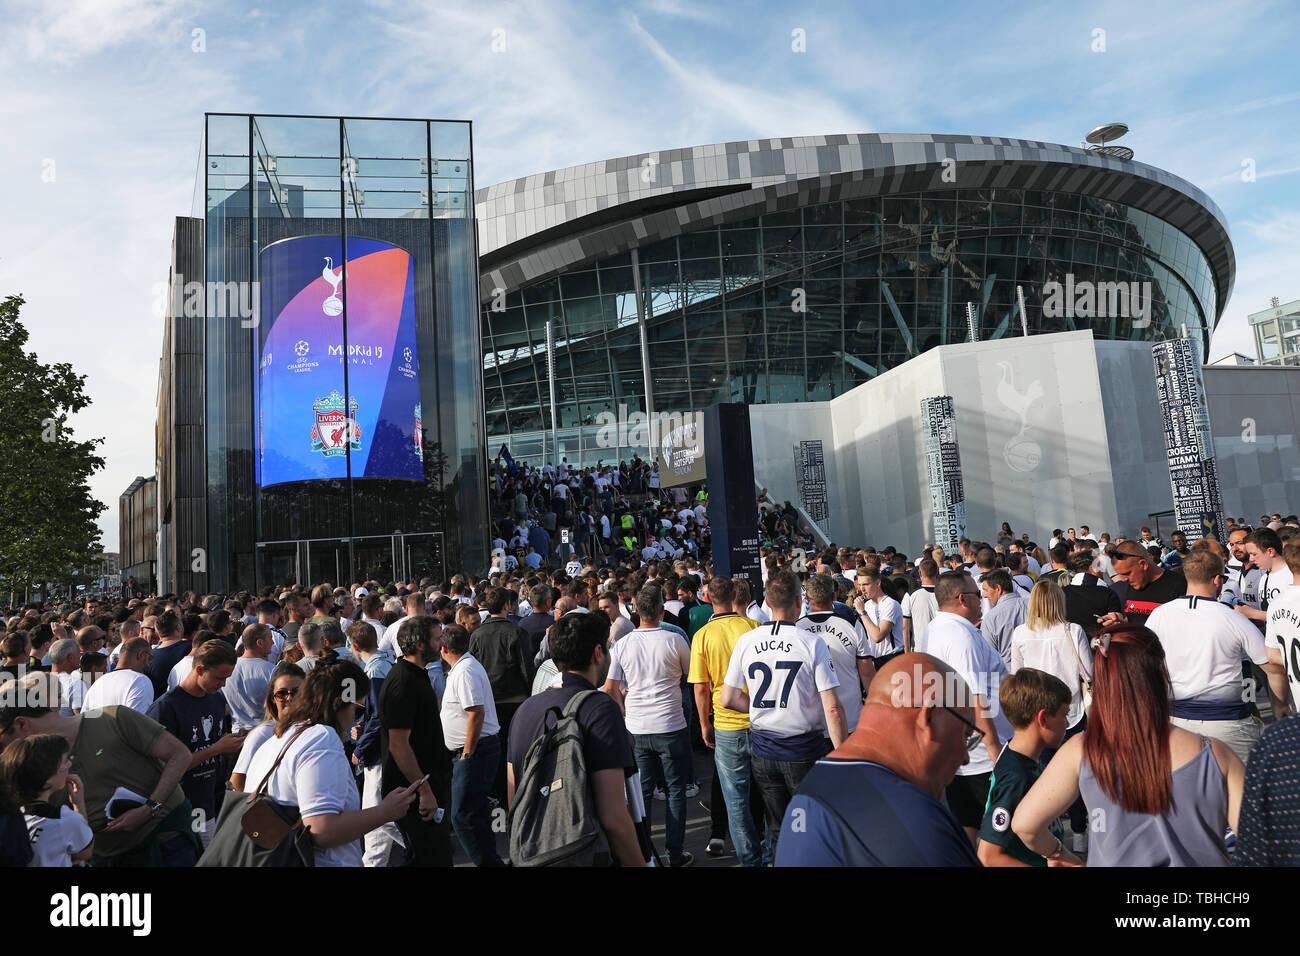 Tottenham Hotspur Fans Outside The Club S Stadium In London Ahead Of The Uefa Champions League Final Between Tottenham And Liverpool At The Wanda Metropolitan Stadium In Madrid Spain On Saturday Night Stock